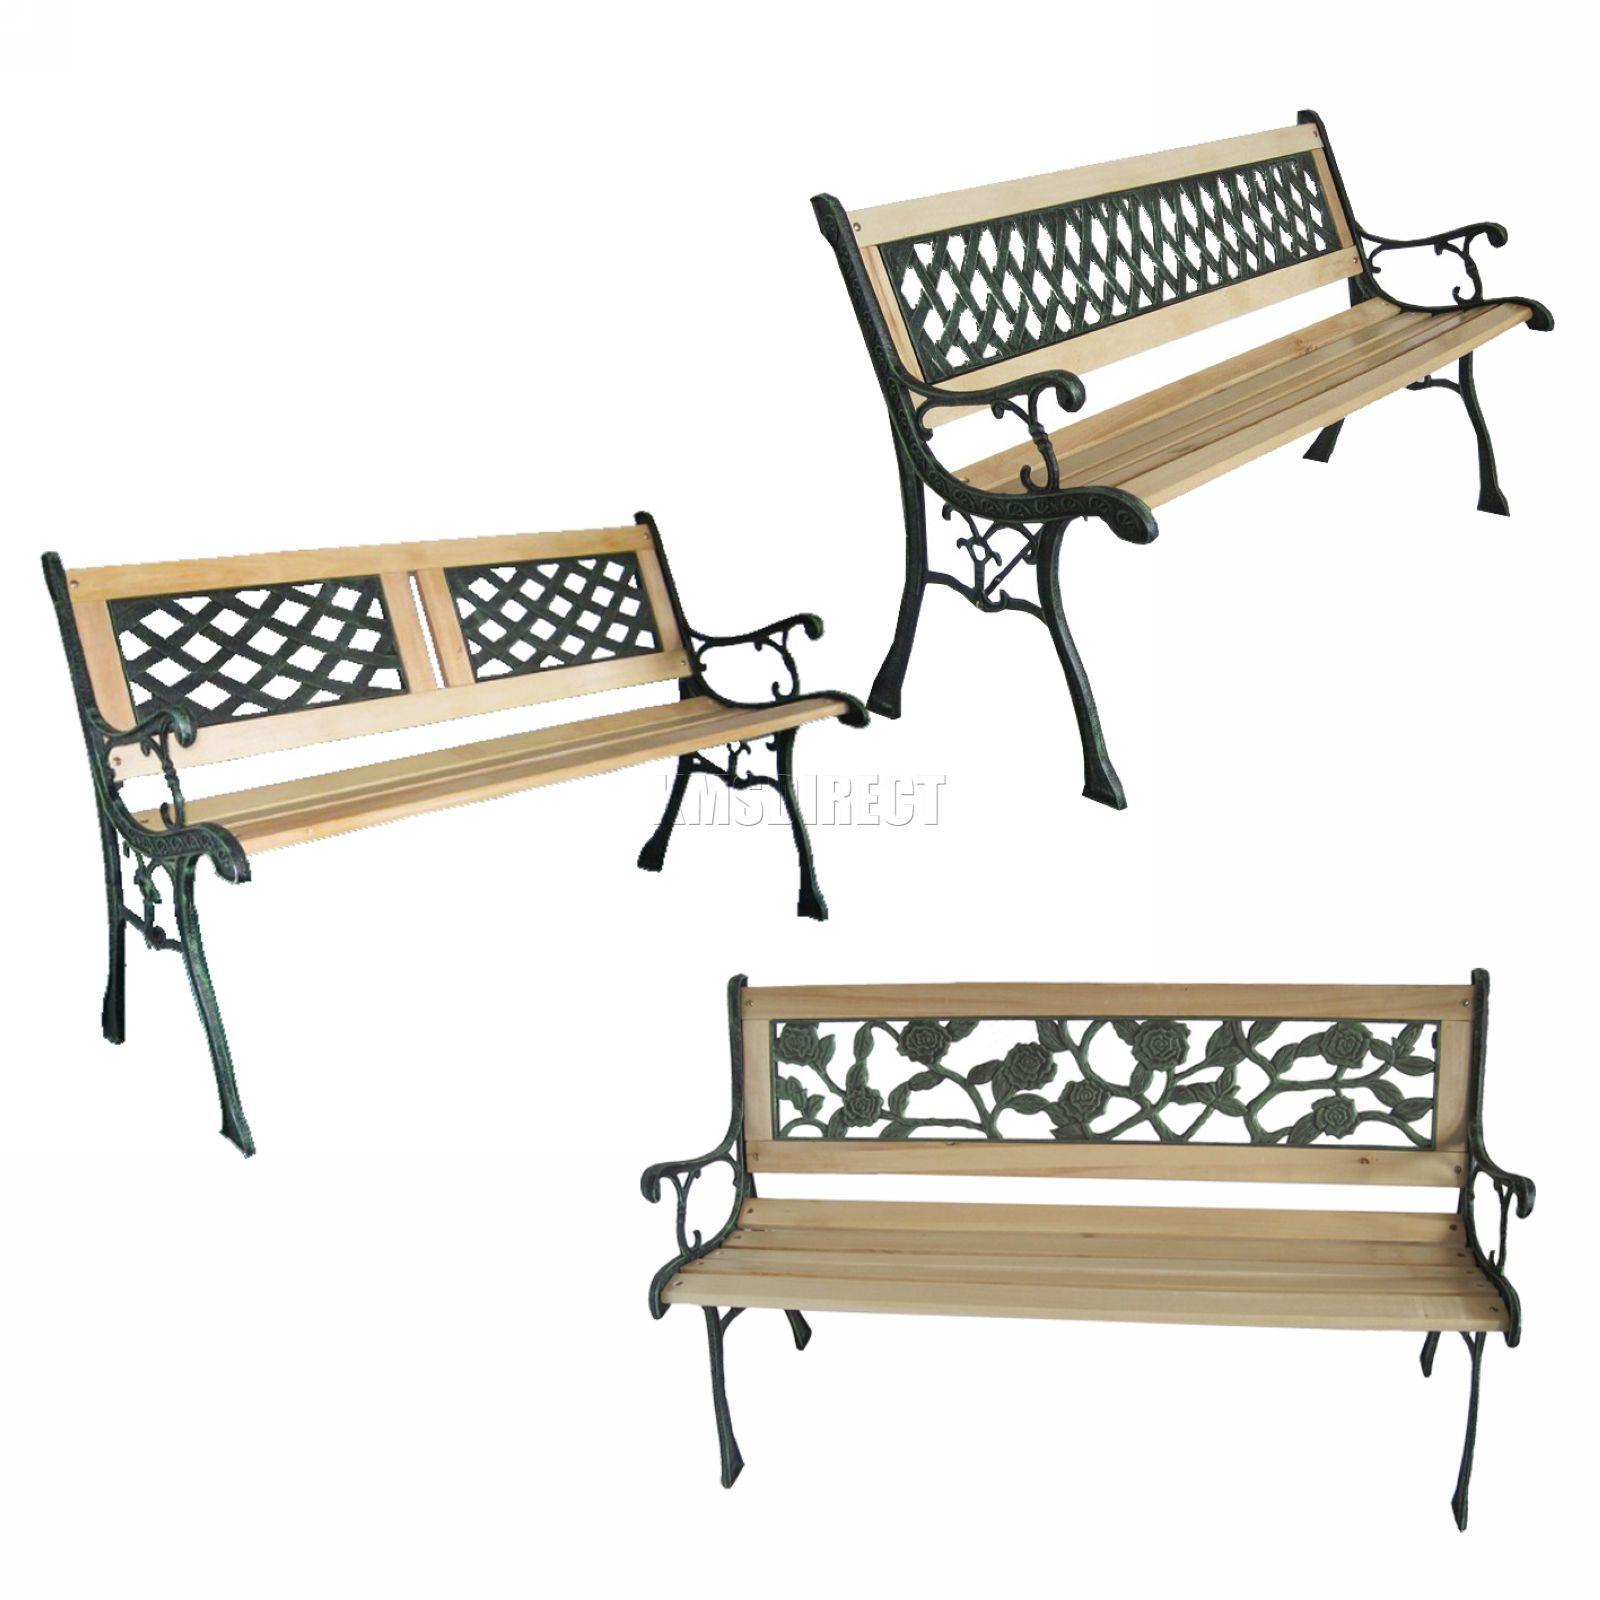 WestWood 3 Seater Outdoor Wooden Garden Bench Cast Iron Legs Park ...